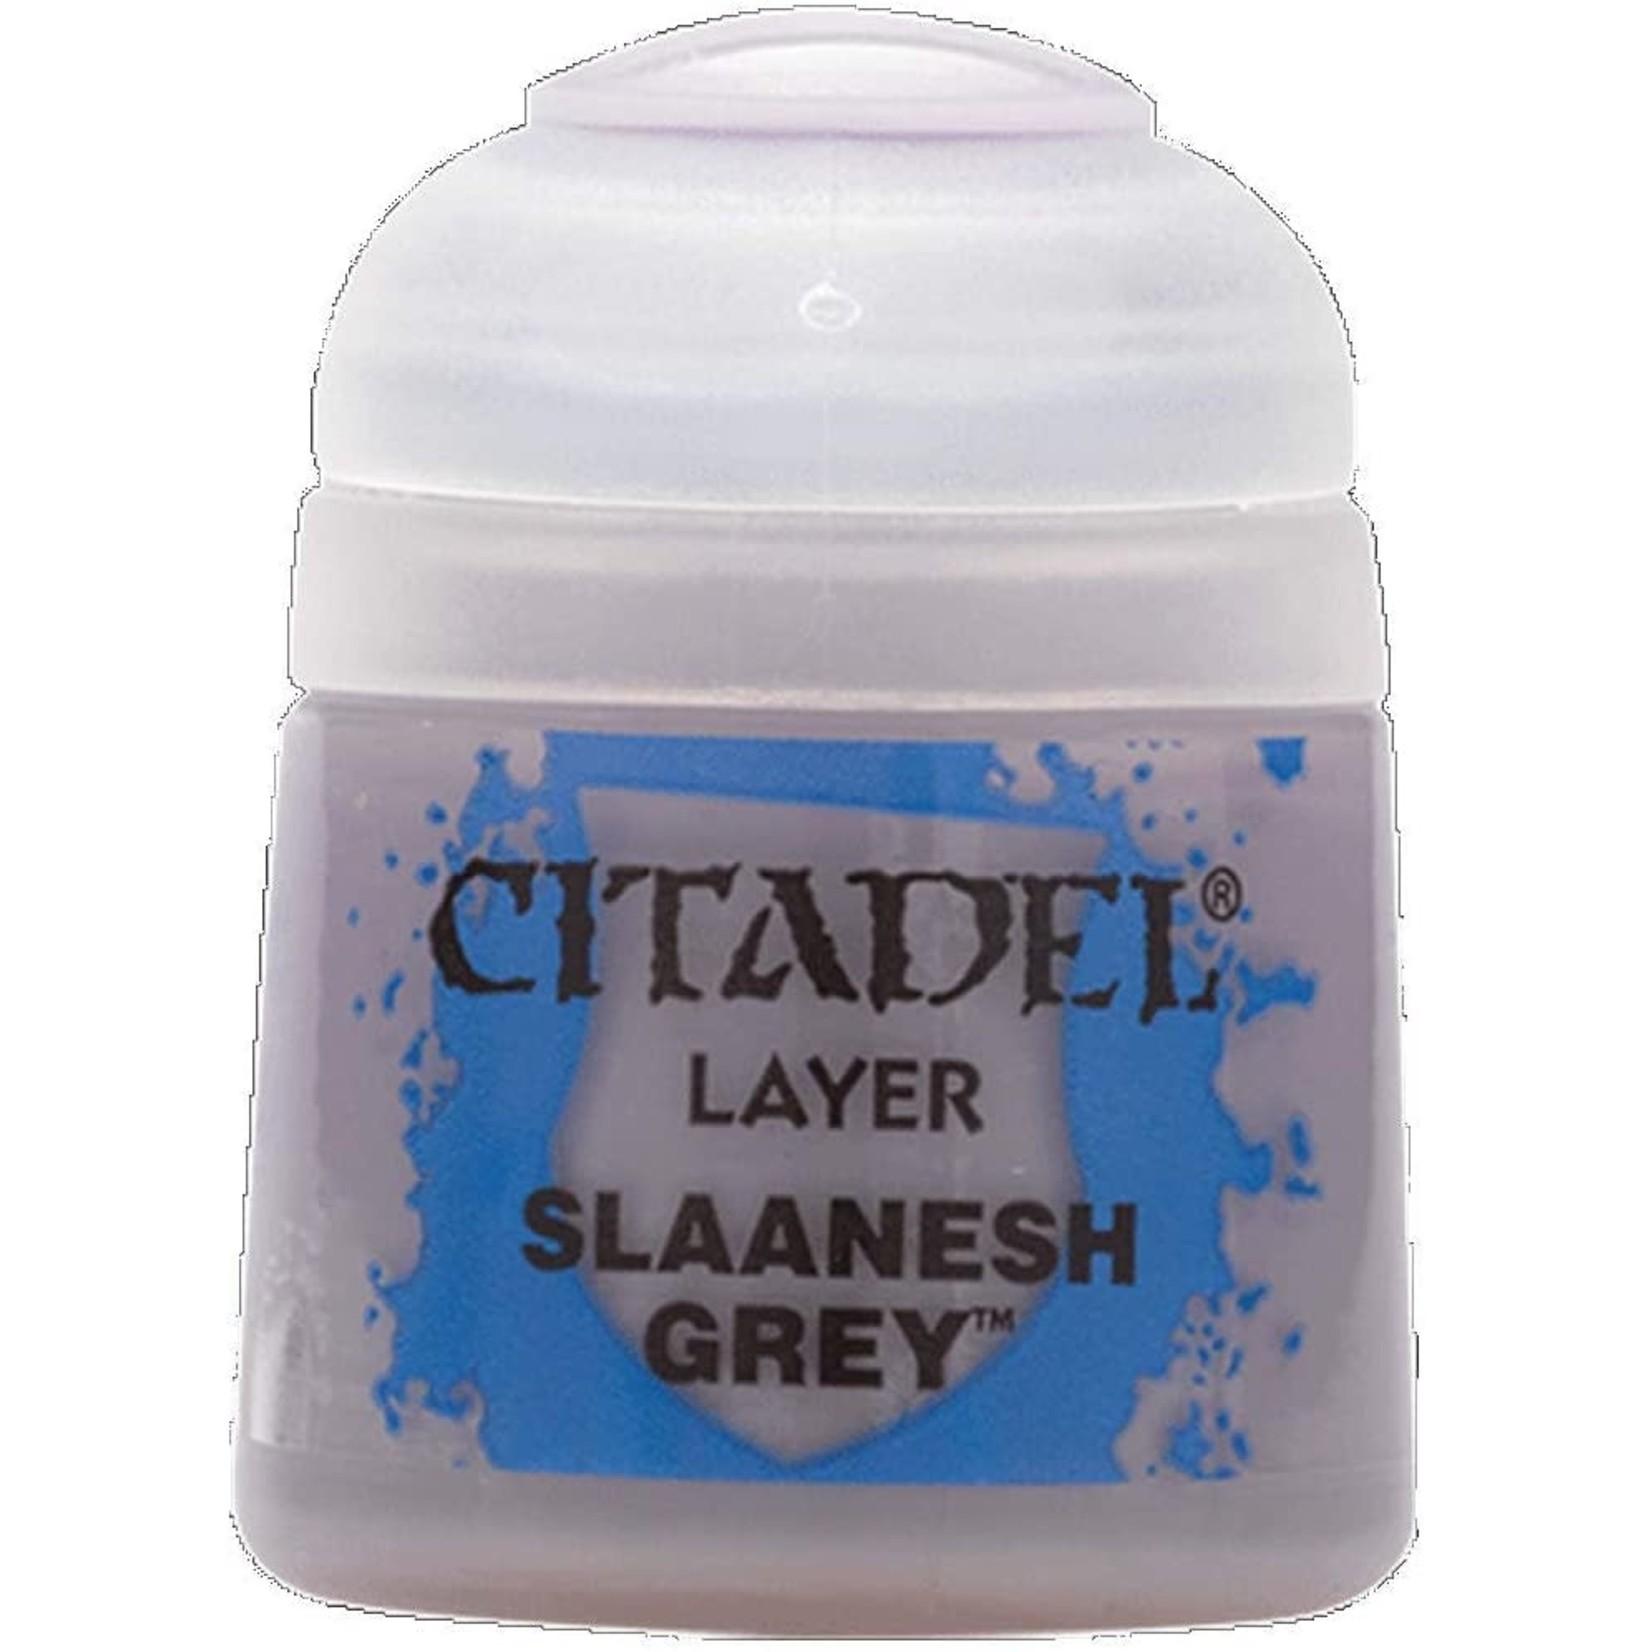 Games Workshop Citadel Paint: Slaanesh Grey 12ml